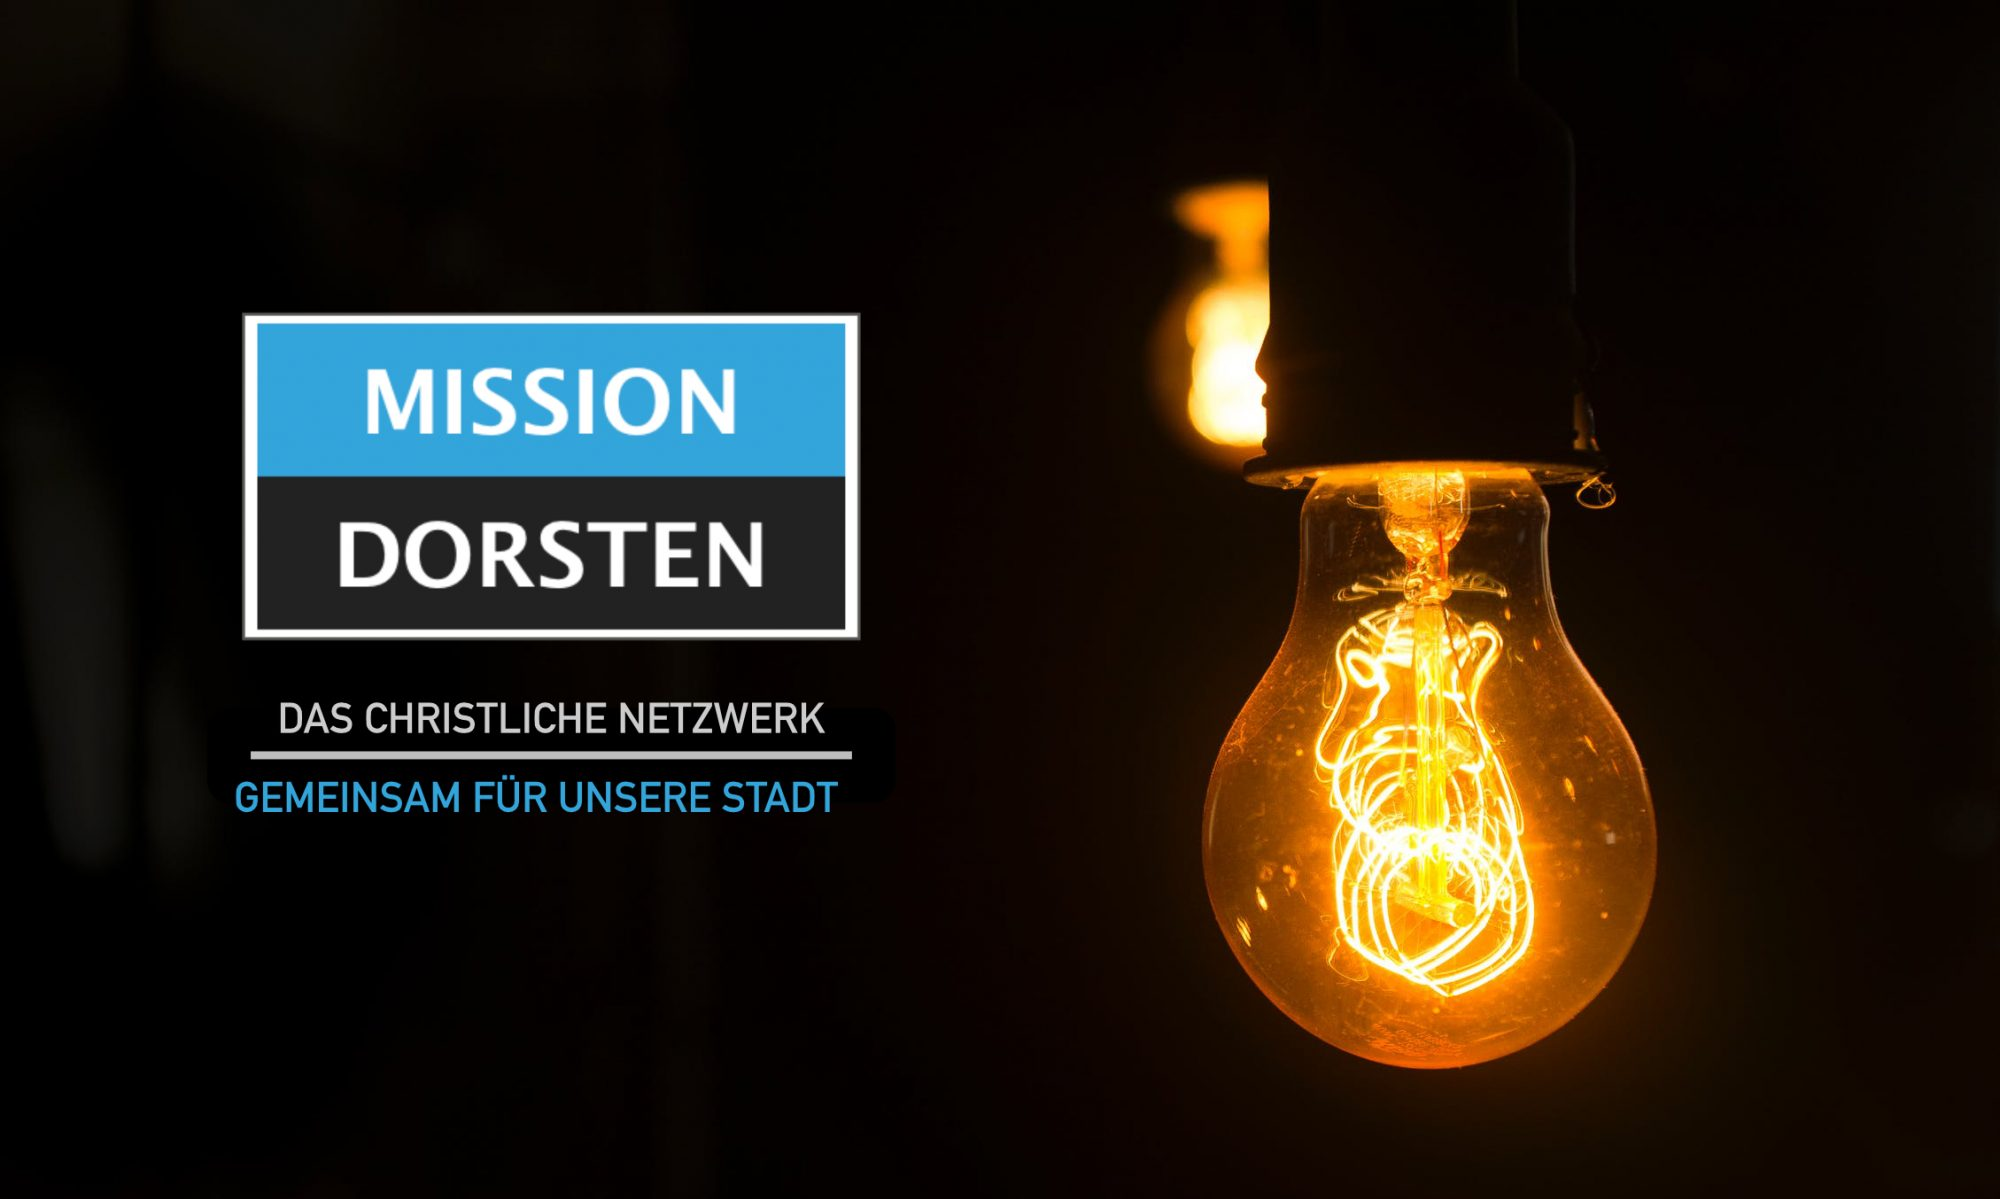 Mission Dorsten